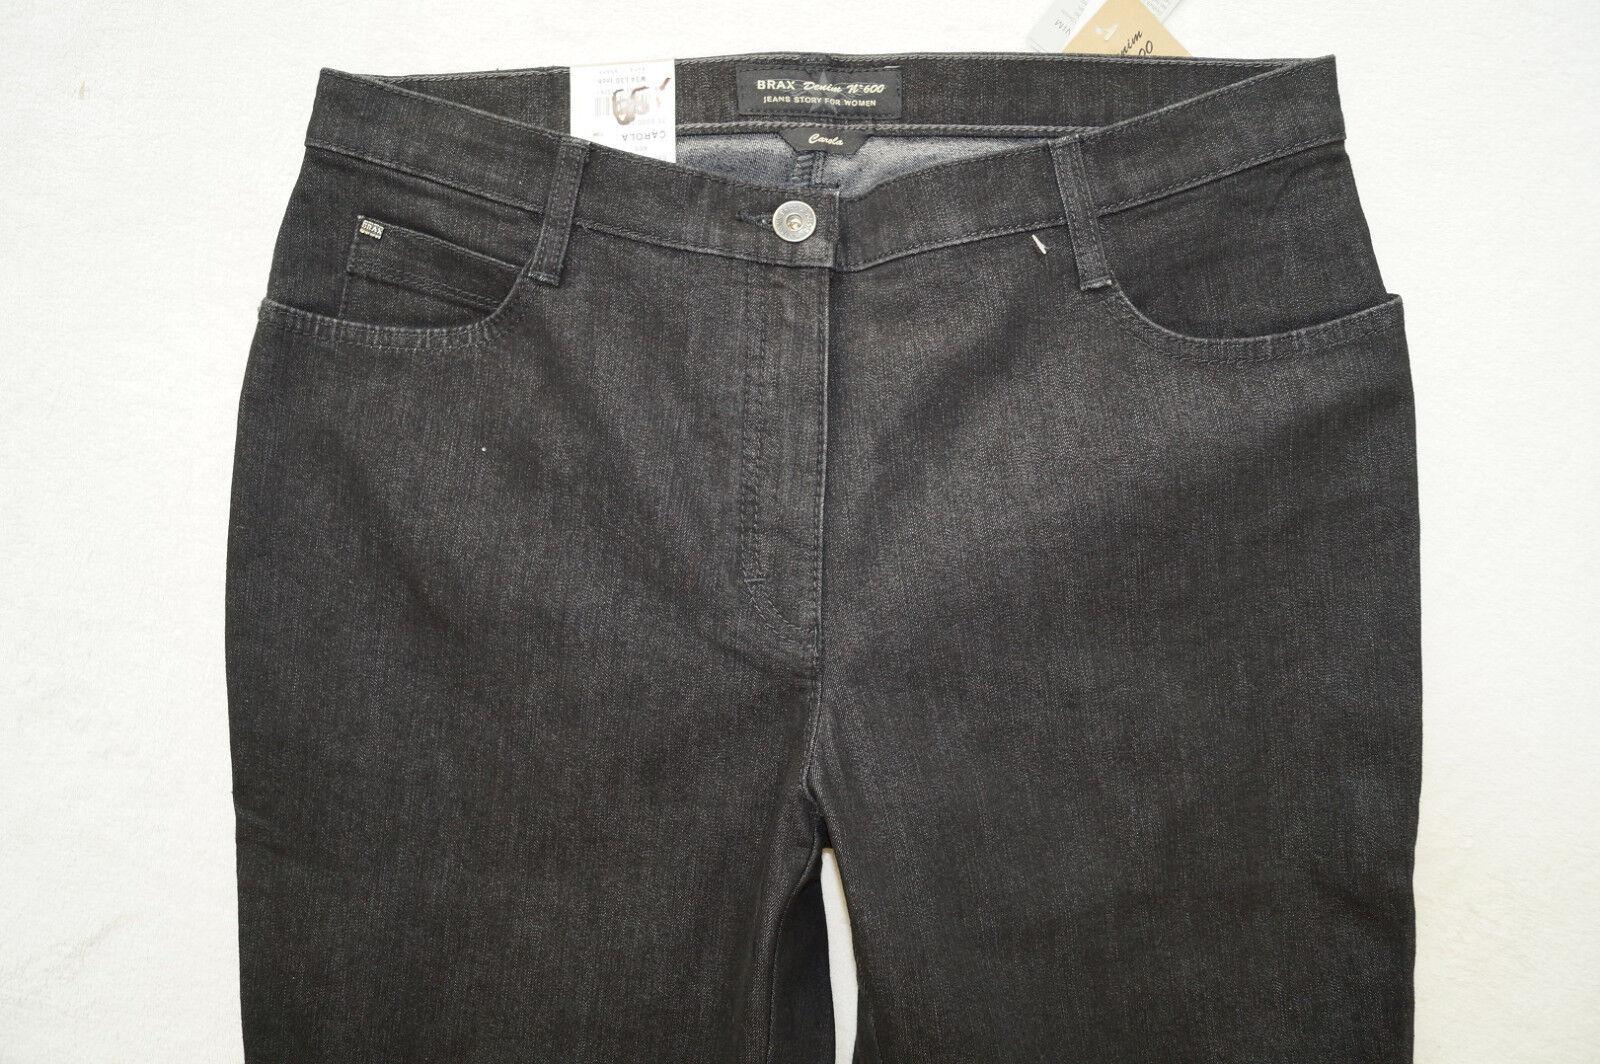 BRAX  CAROLA  Jeans Denim Denim Denim Nr.600  Gr. 38, 44  L30, 34 Feminine Fit  schwarz NEU | Zürich  02f558